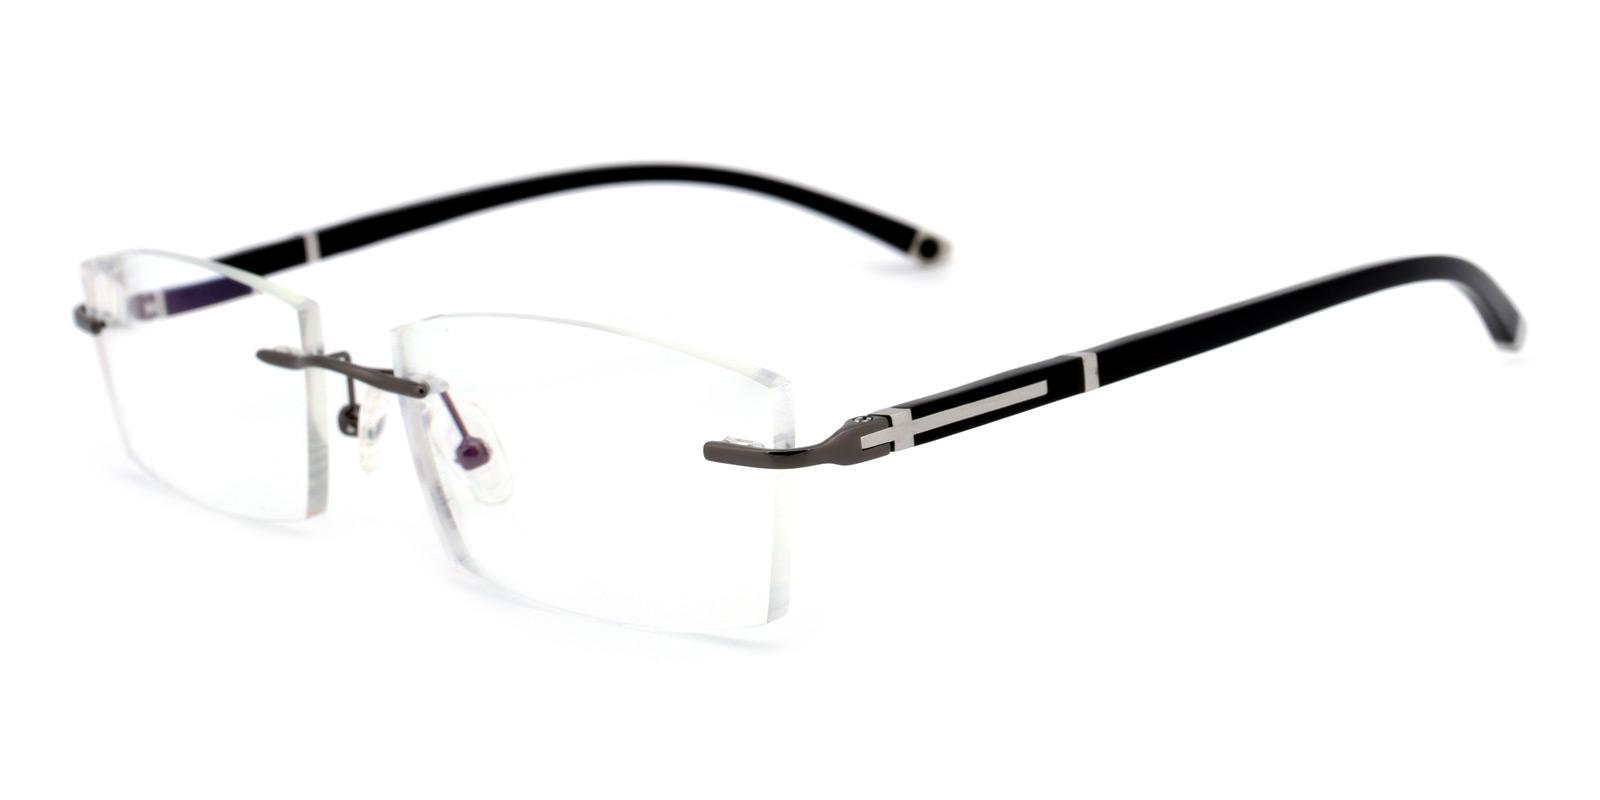 Doumbia-Black-Varieties-Titanium-Eyeglasses-additional1